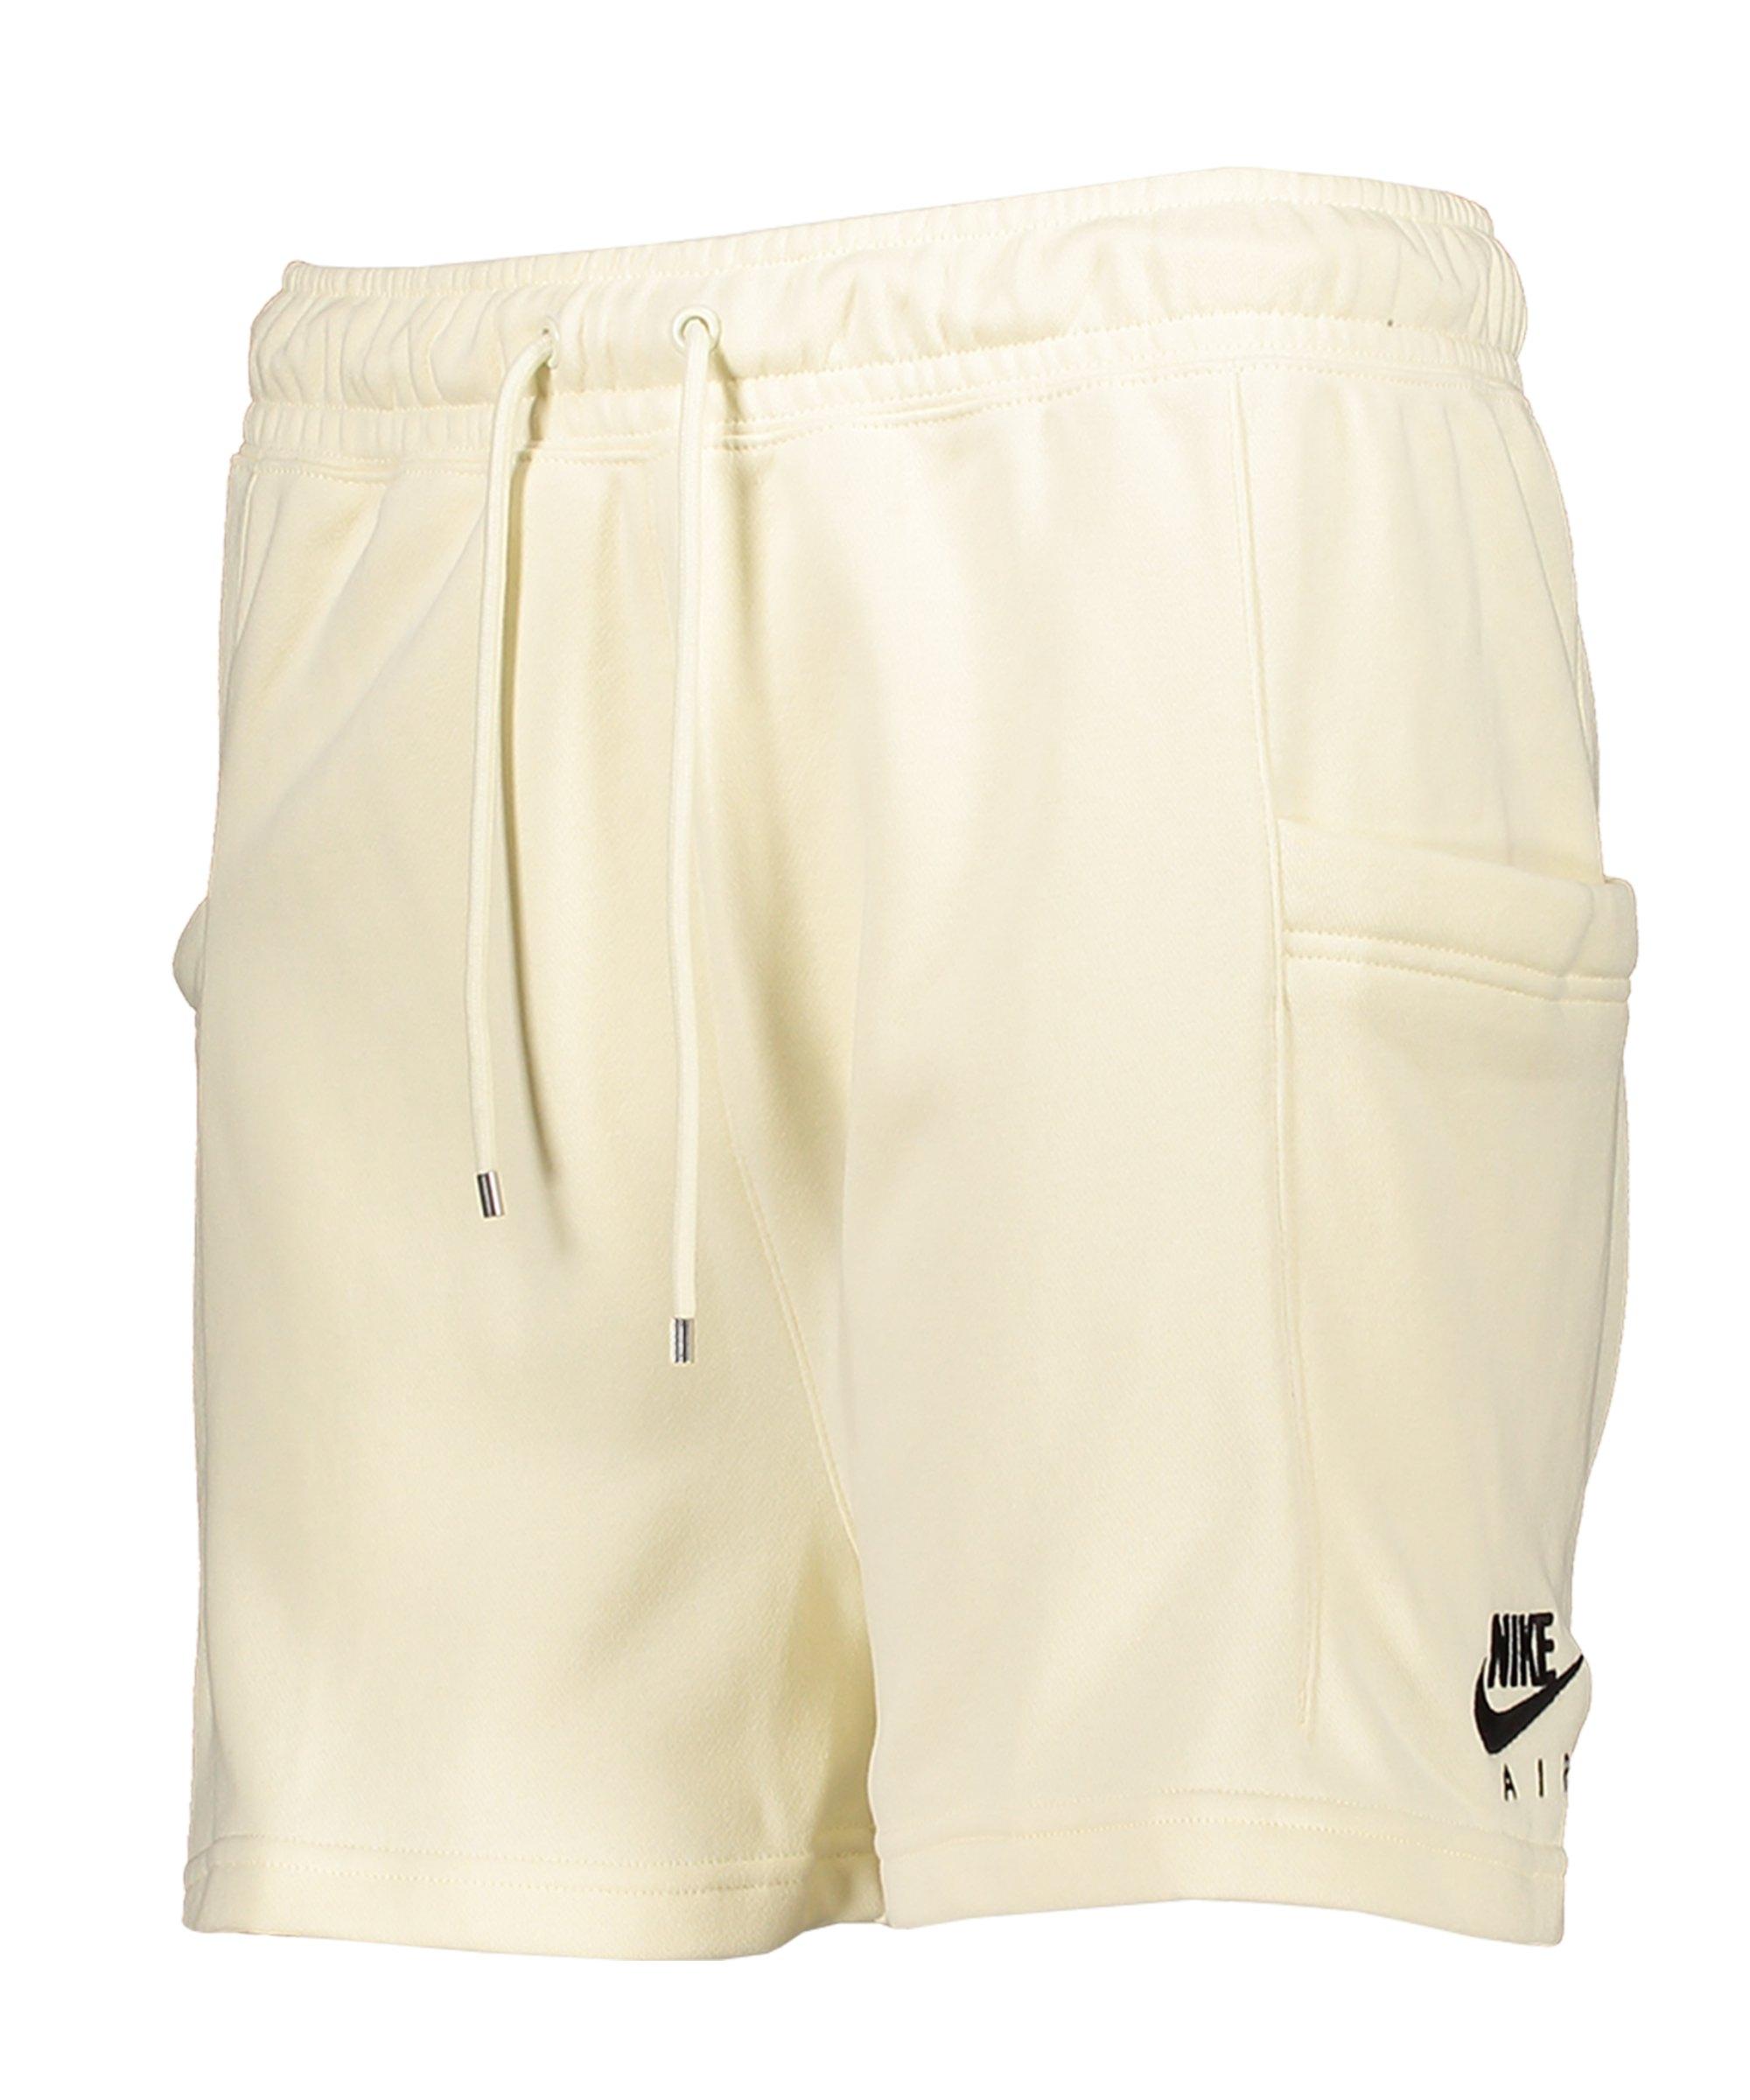 Nike Air Fleece Short Damen Beige Schwarz F113 - beige